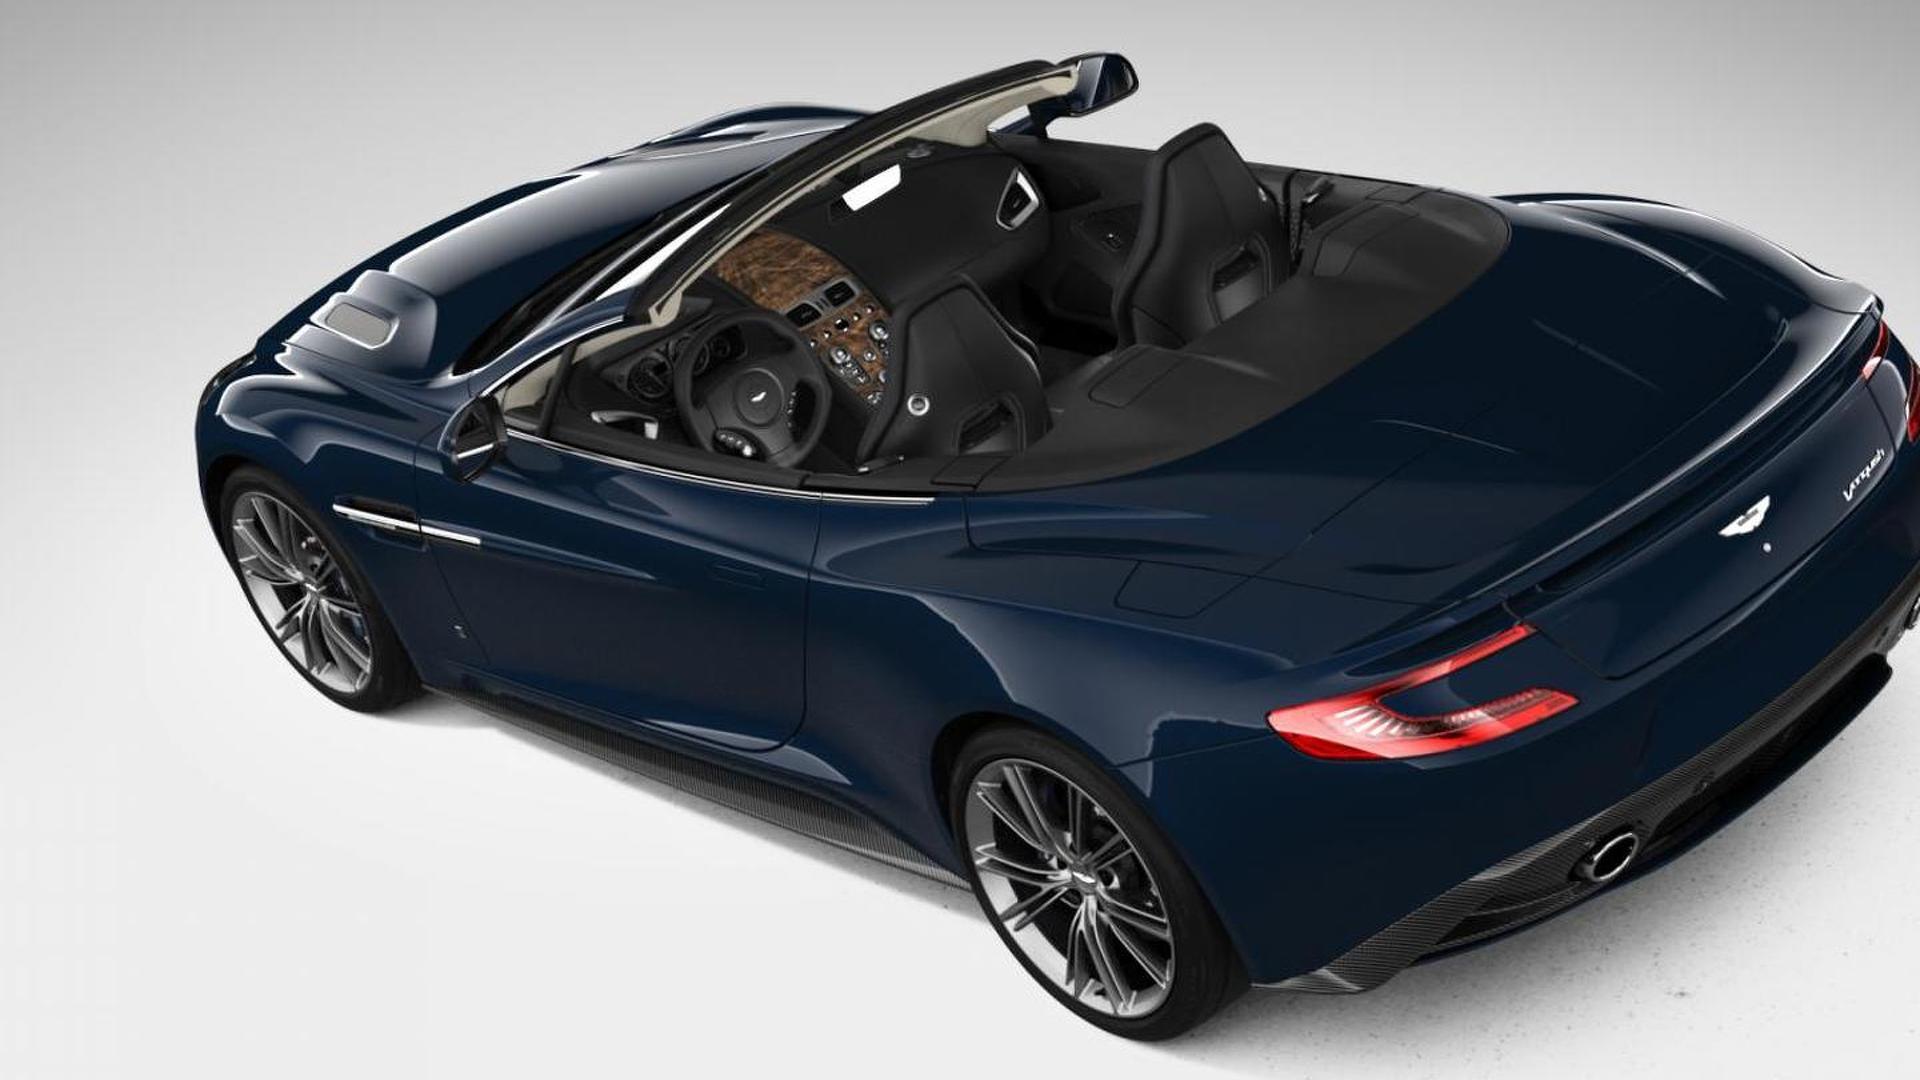 Aston Martin Vanquish Volante Neiman Marcus Edition to debut in Los Angeles